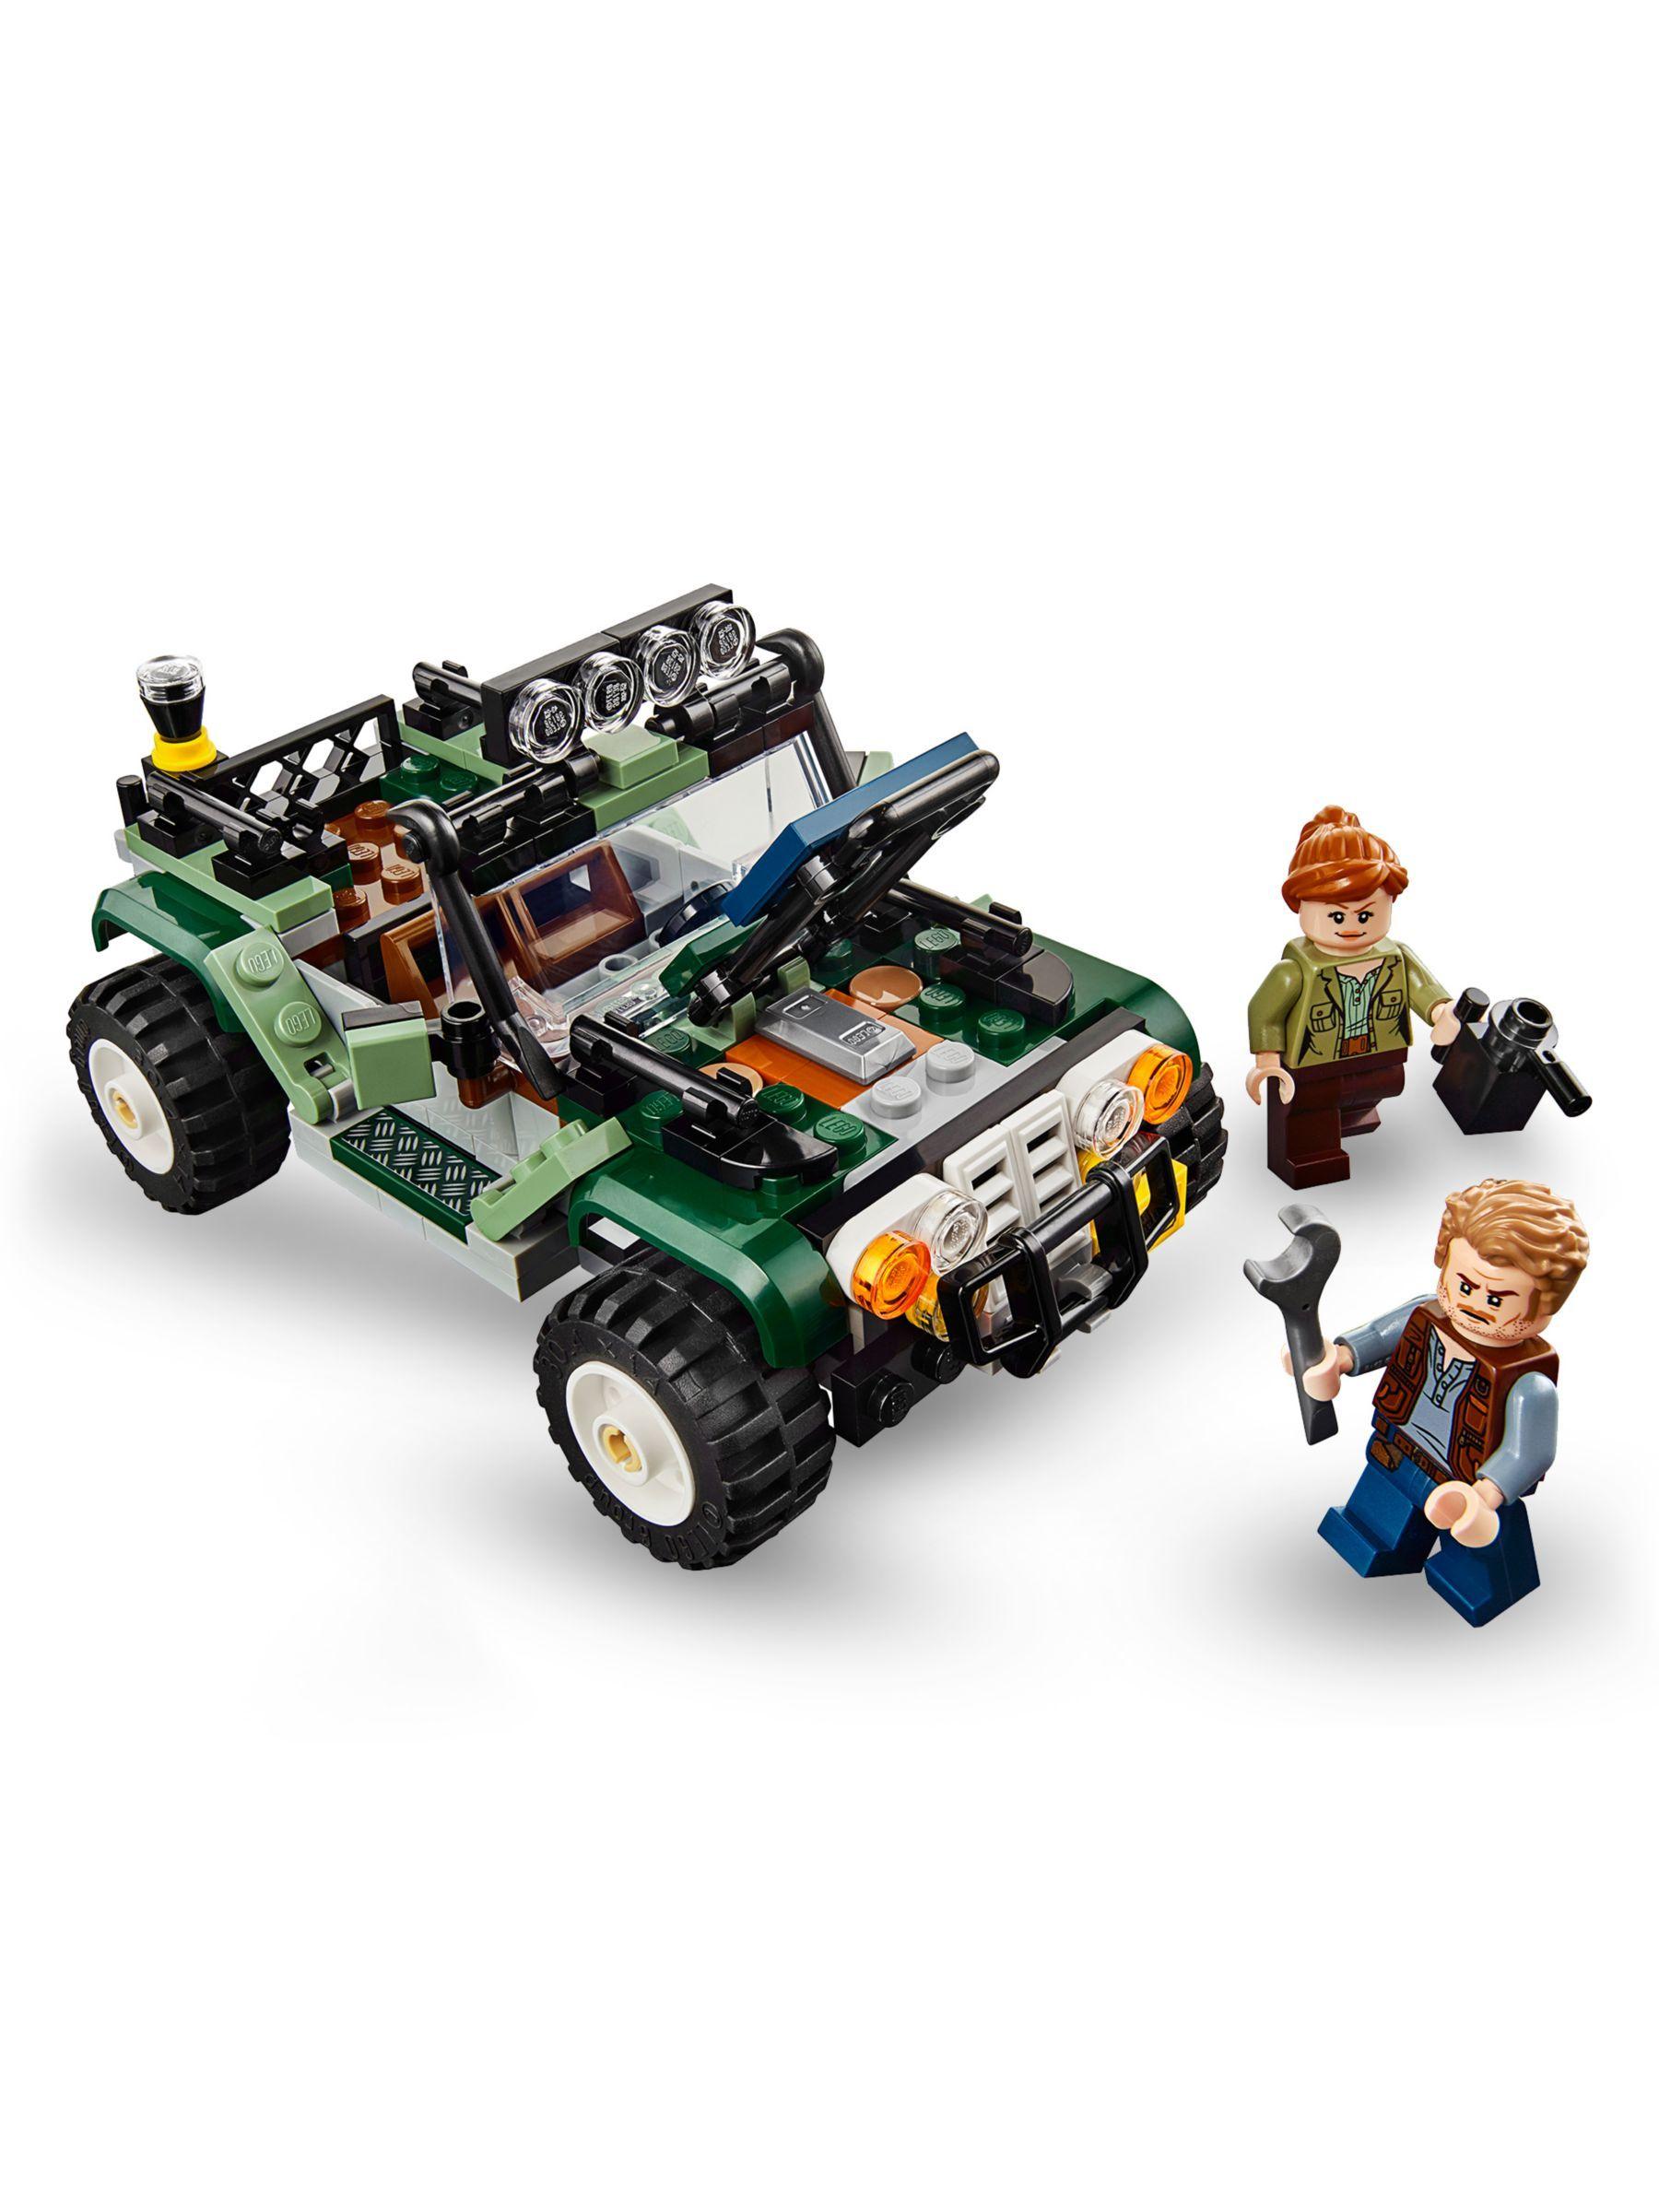 Lego Jurassic World Minifigure SINJIN  PRESCOTT with Backpack from set 75935 New